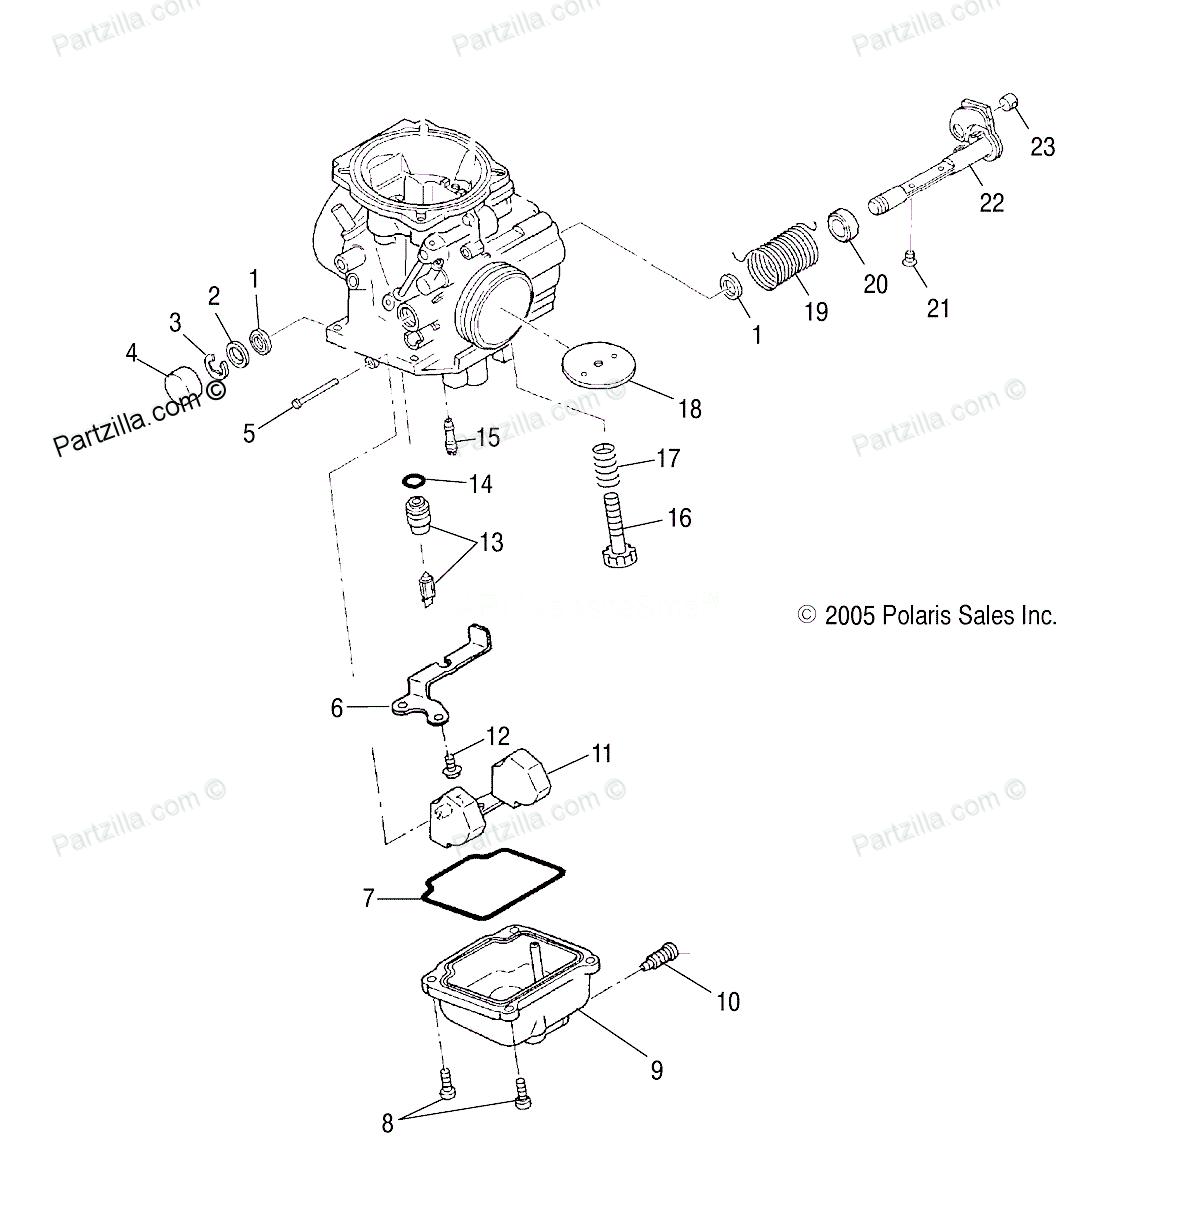 hight resolution of polaris 330 carb diagram wiring diagram gp polaris magnum 330 carb diagram 2007 polaris trail boss